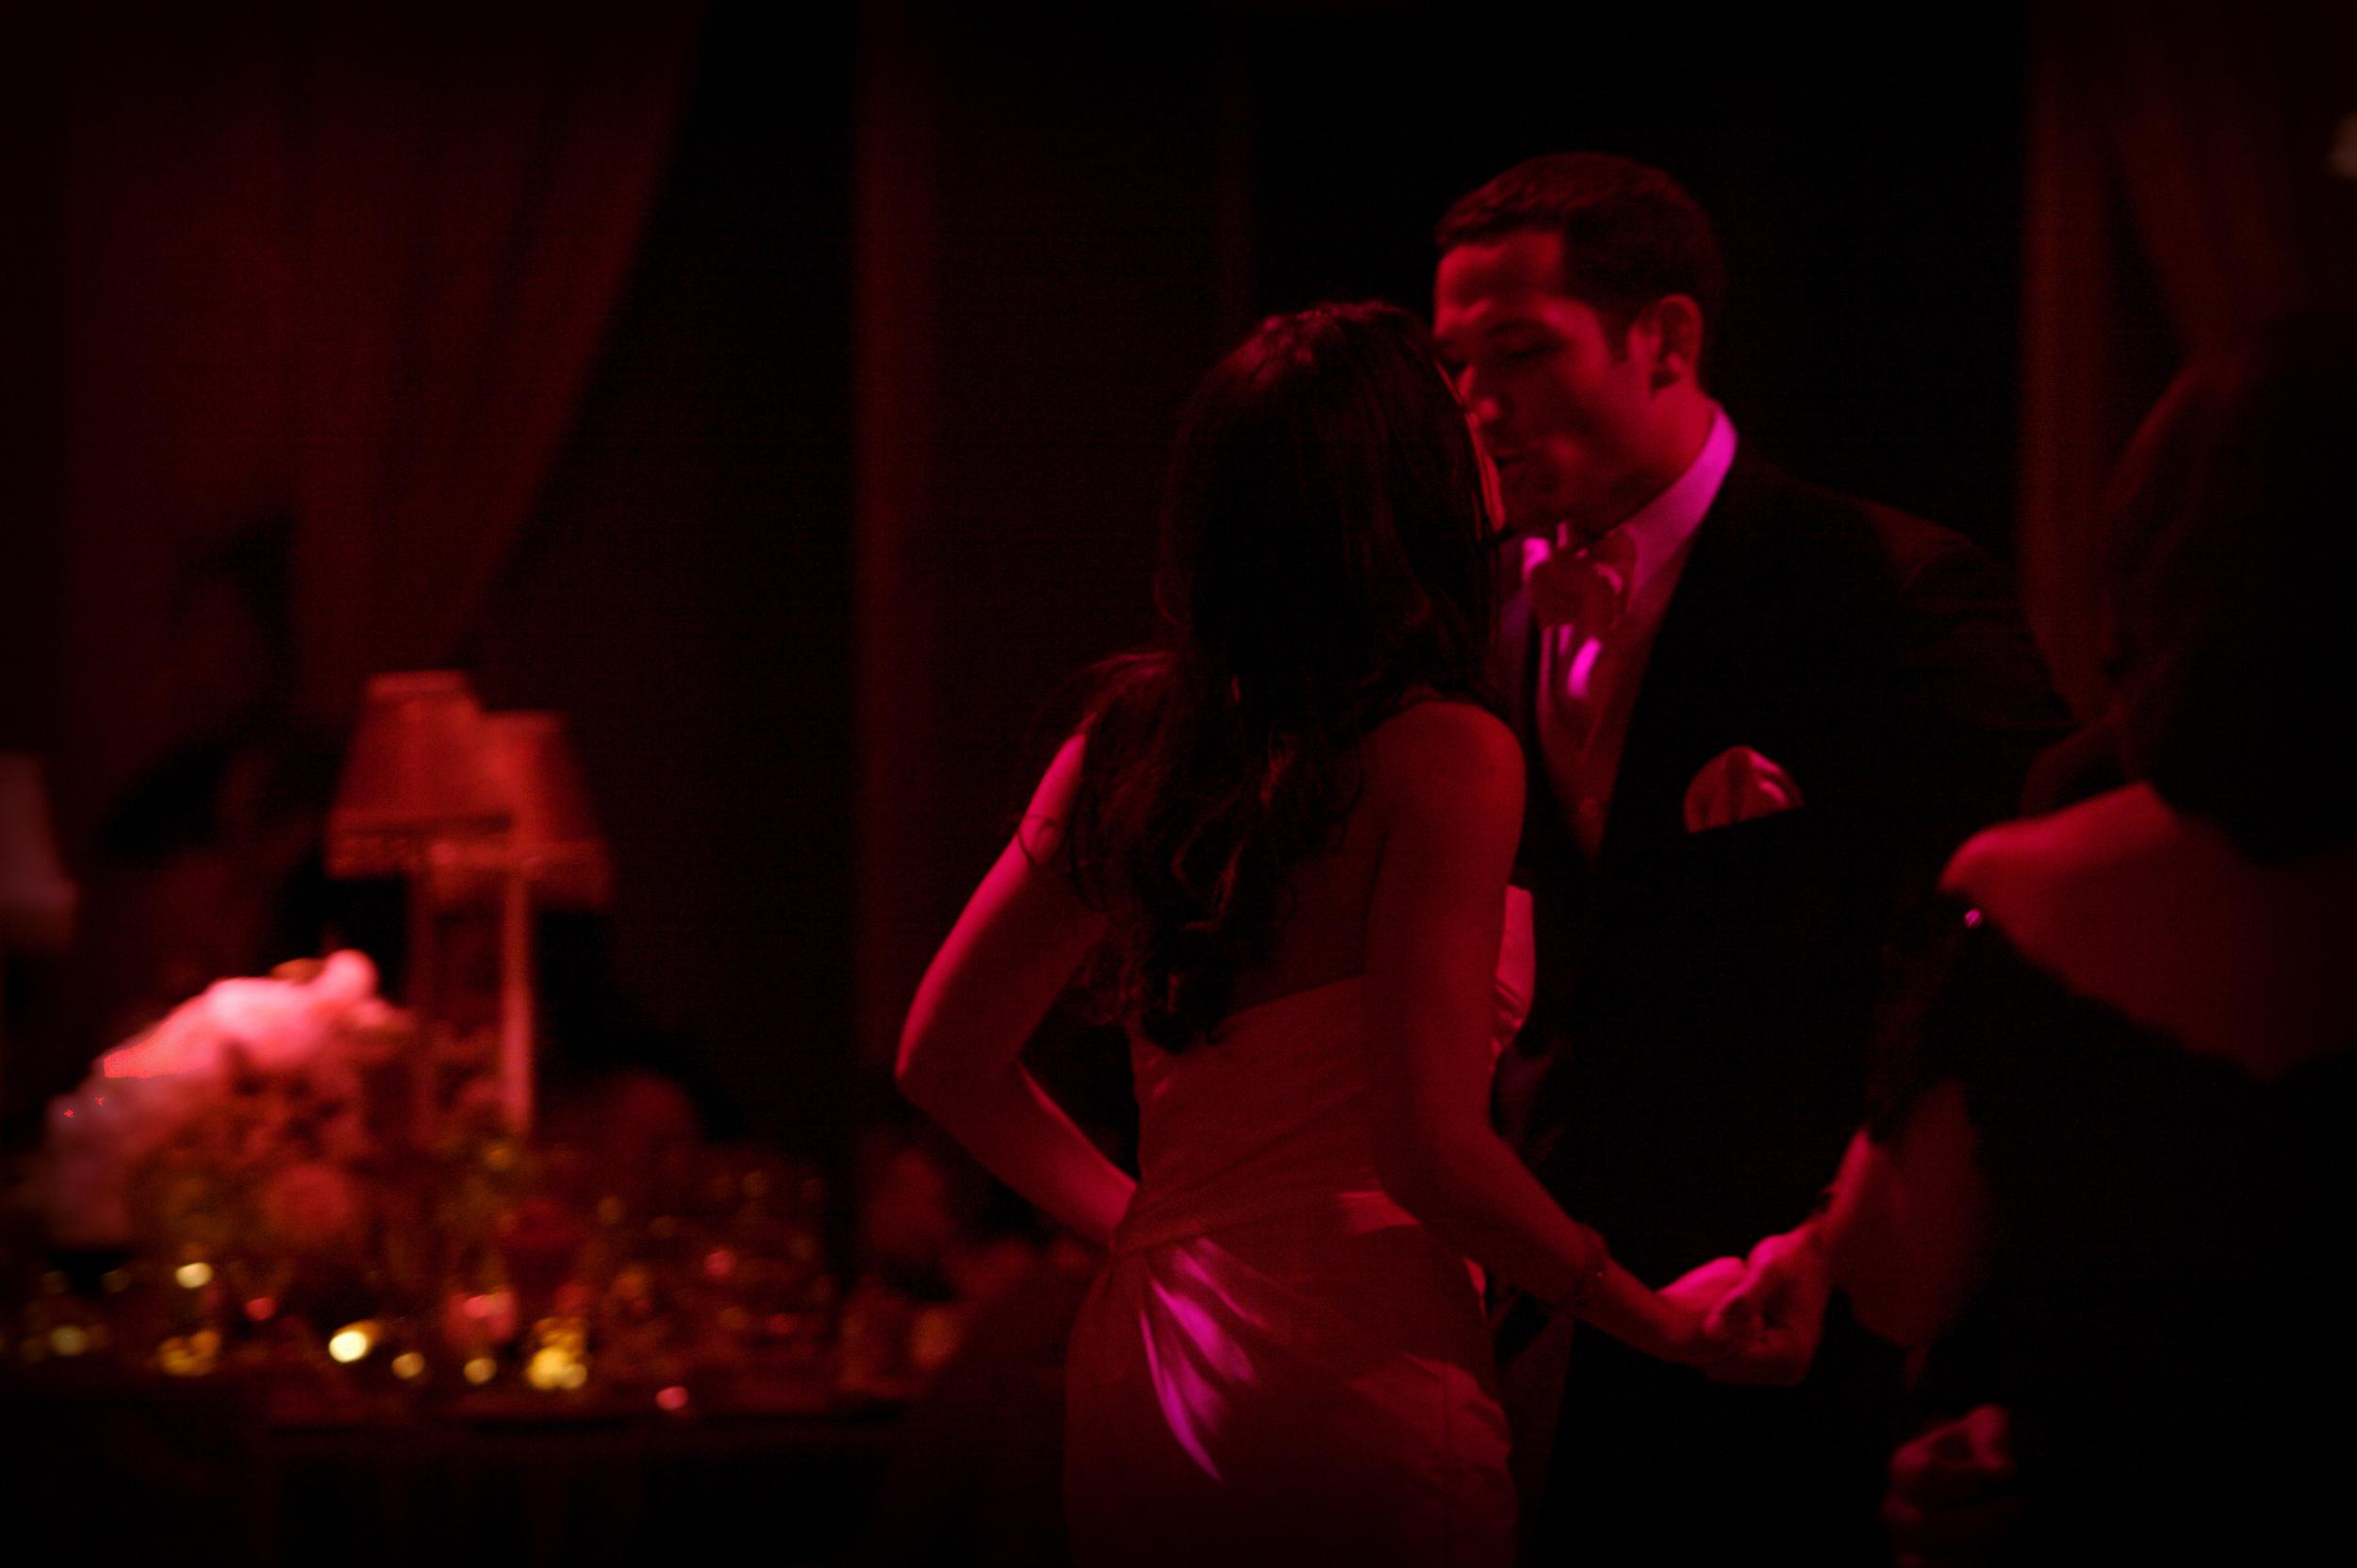 LAST DANCE KISS